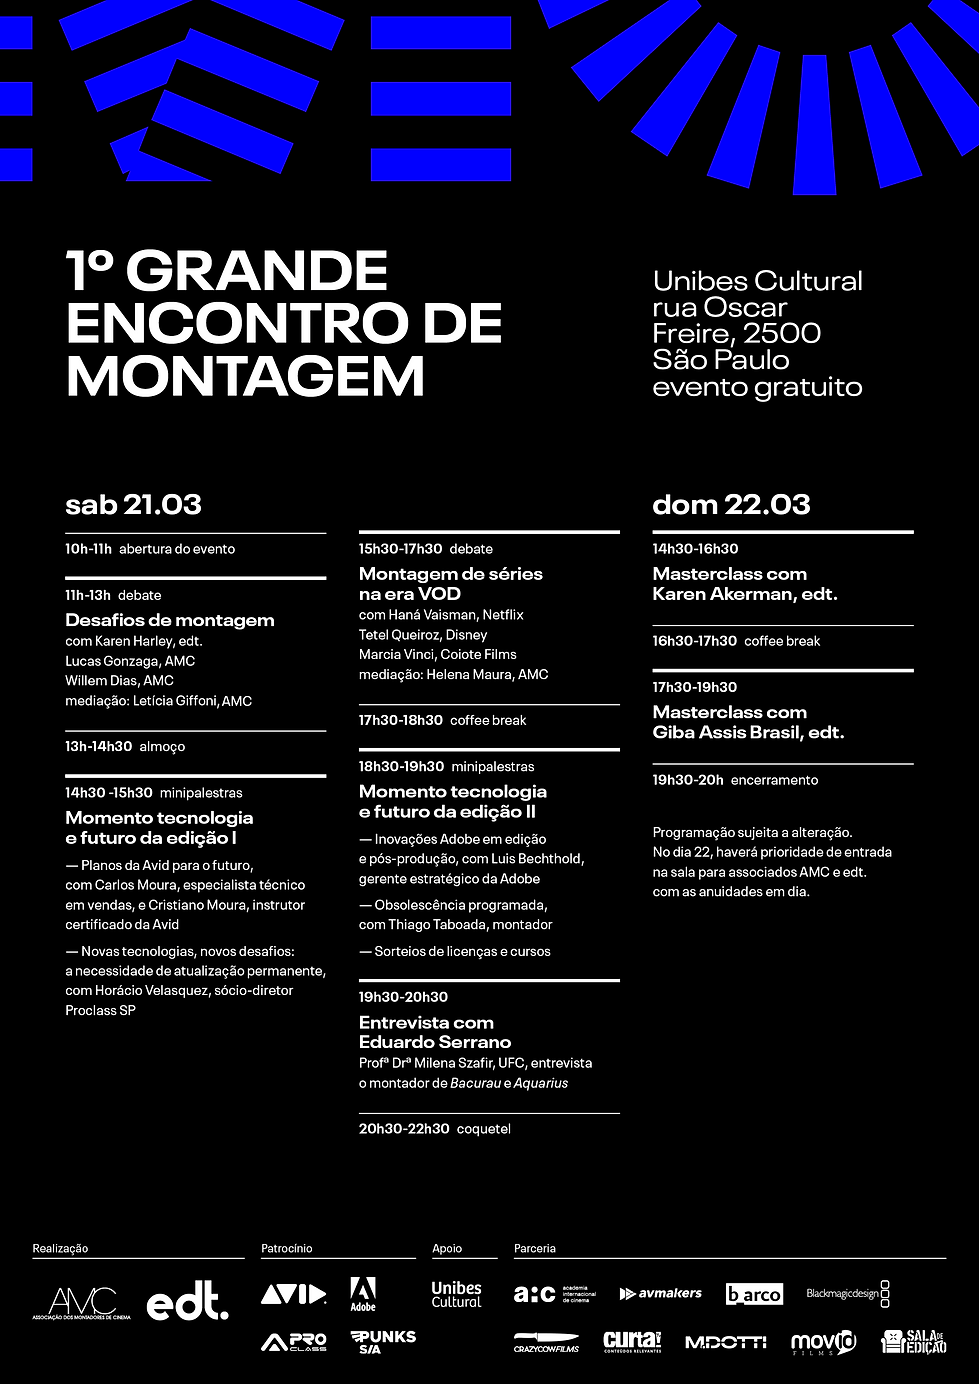 1oGrandeEncontroDeMontagem_programacao-1